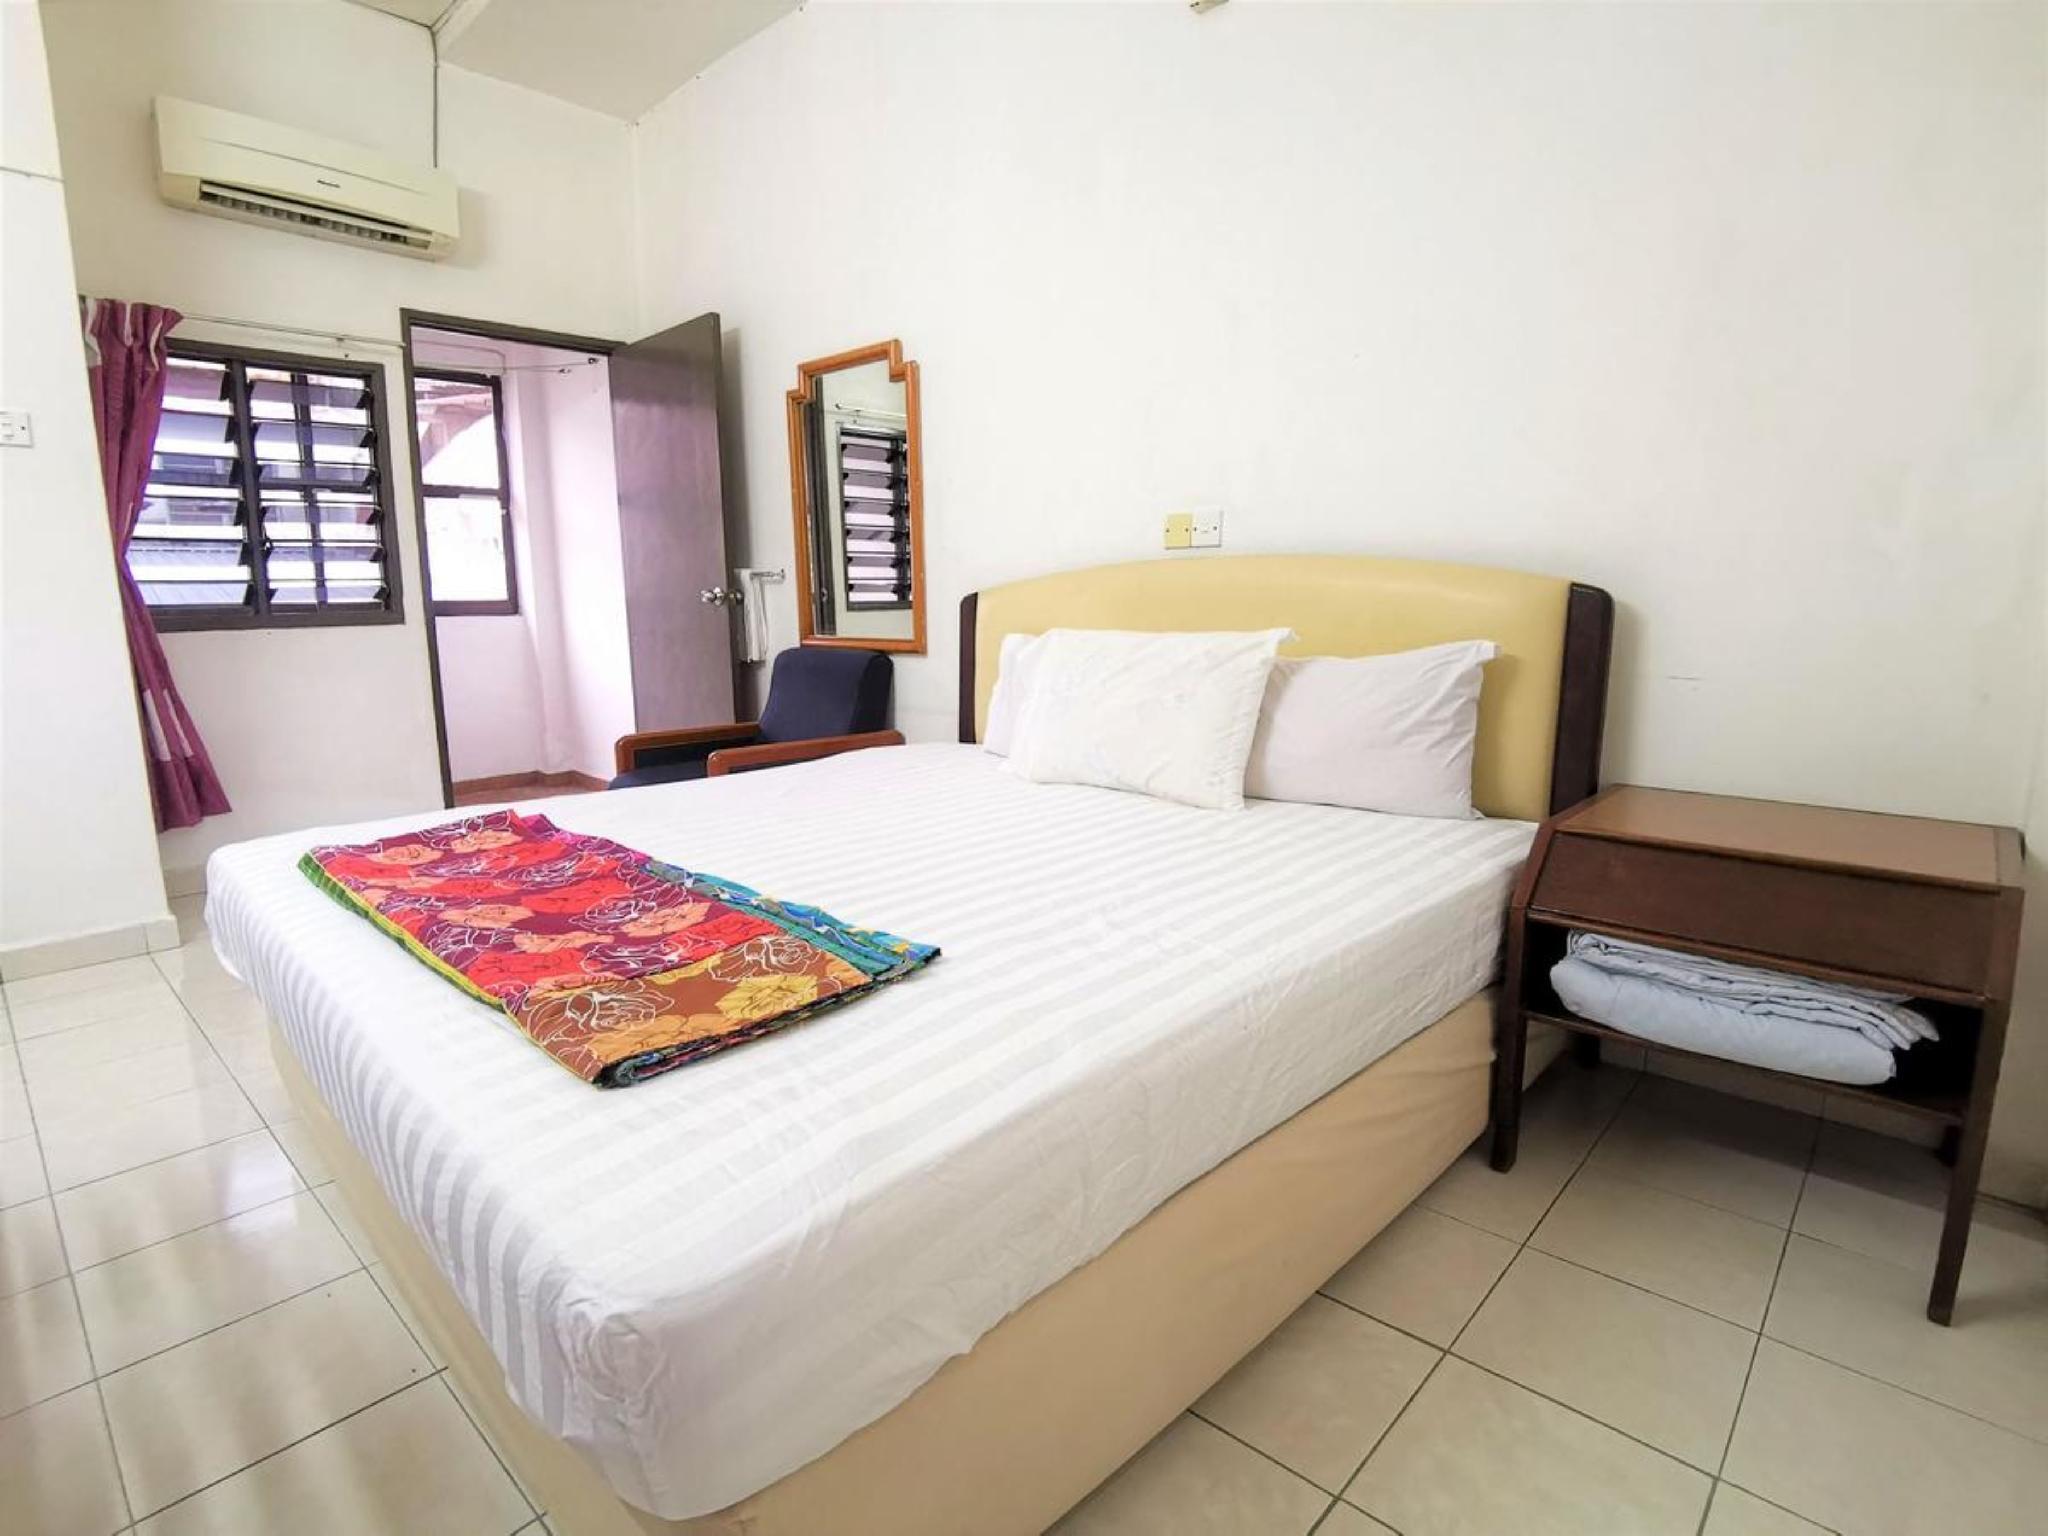 Star Hotel, Budget, Lodge